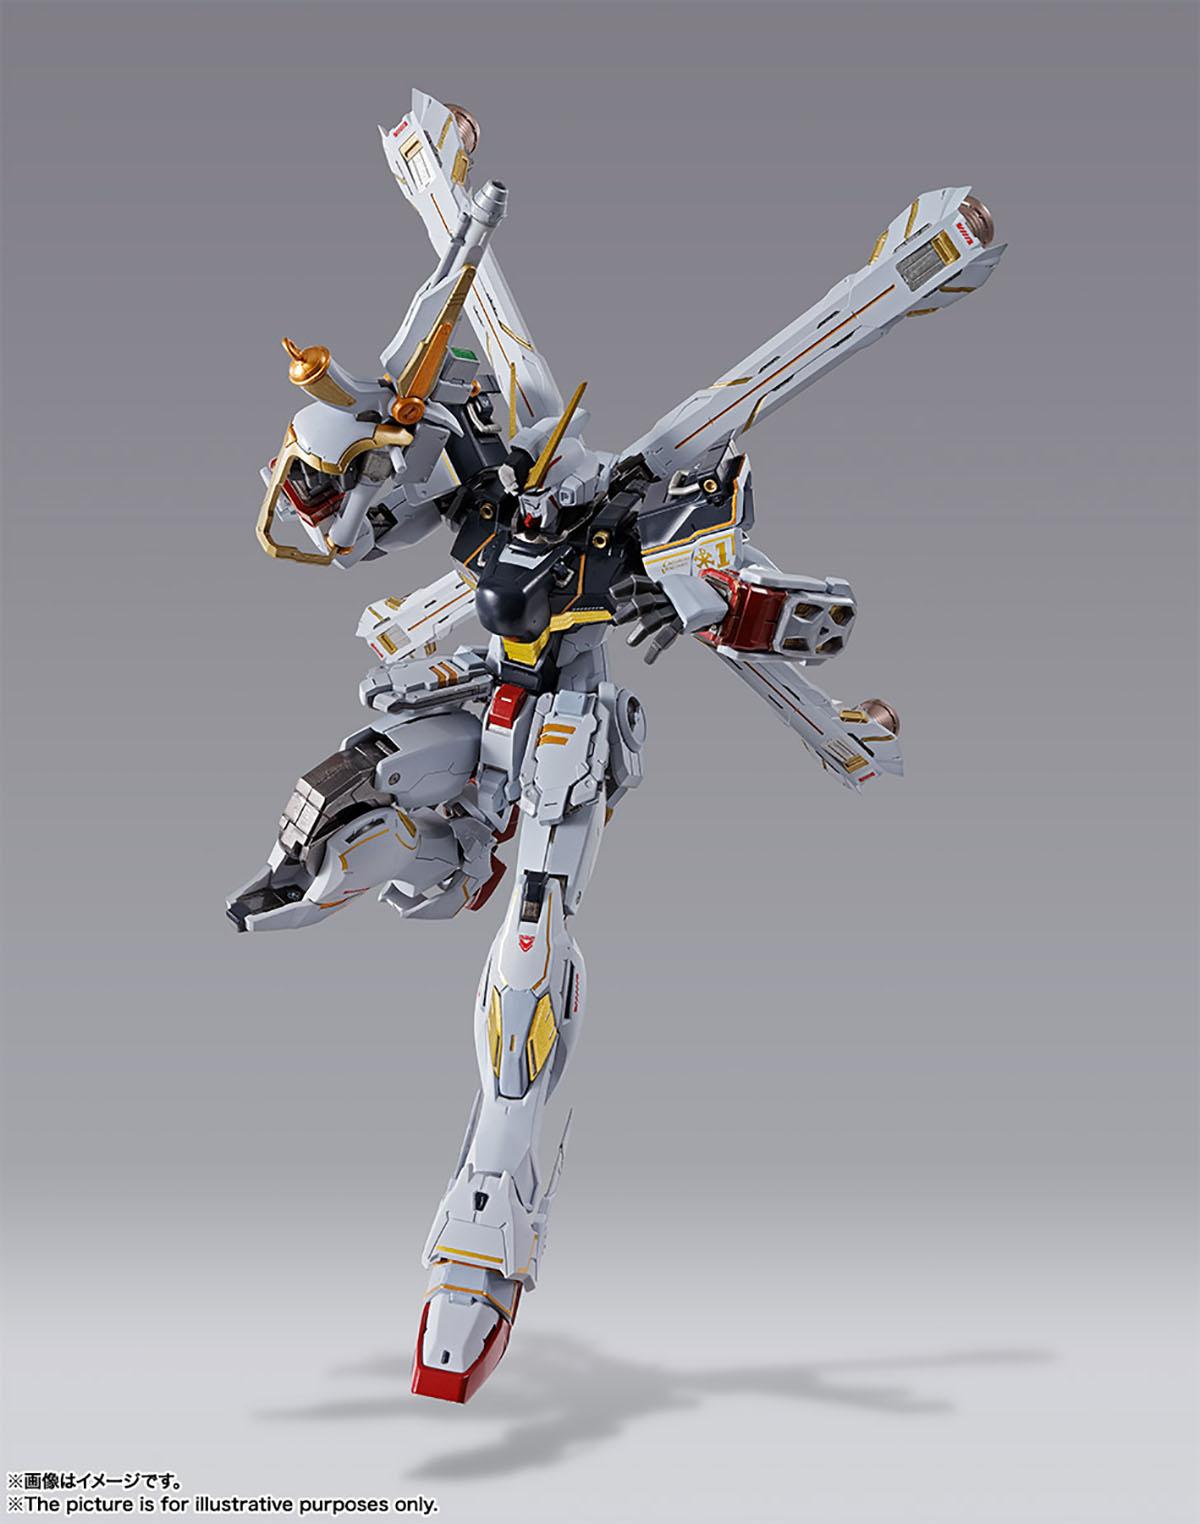 METAL BUILD『クロスボーン・ガンダムX1』機動戦士クロスボーン・ガンダム 可動フィギュア-010